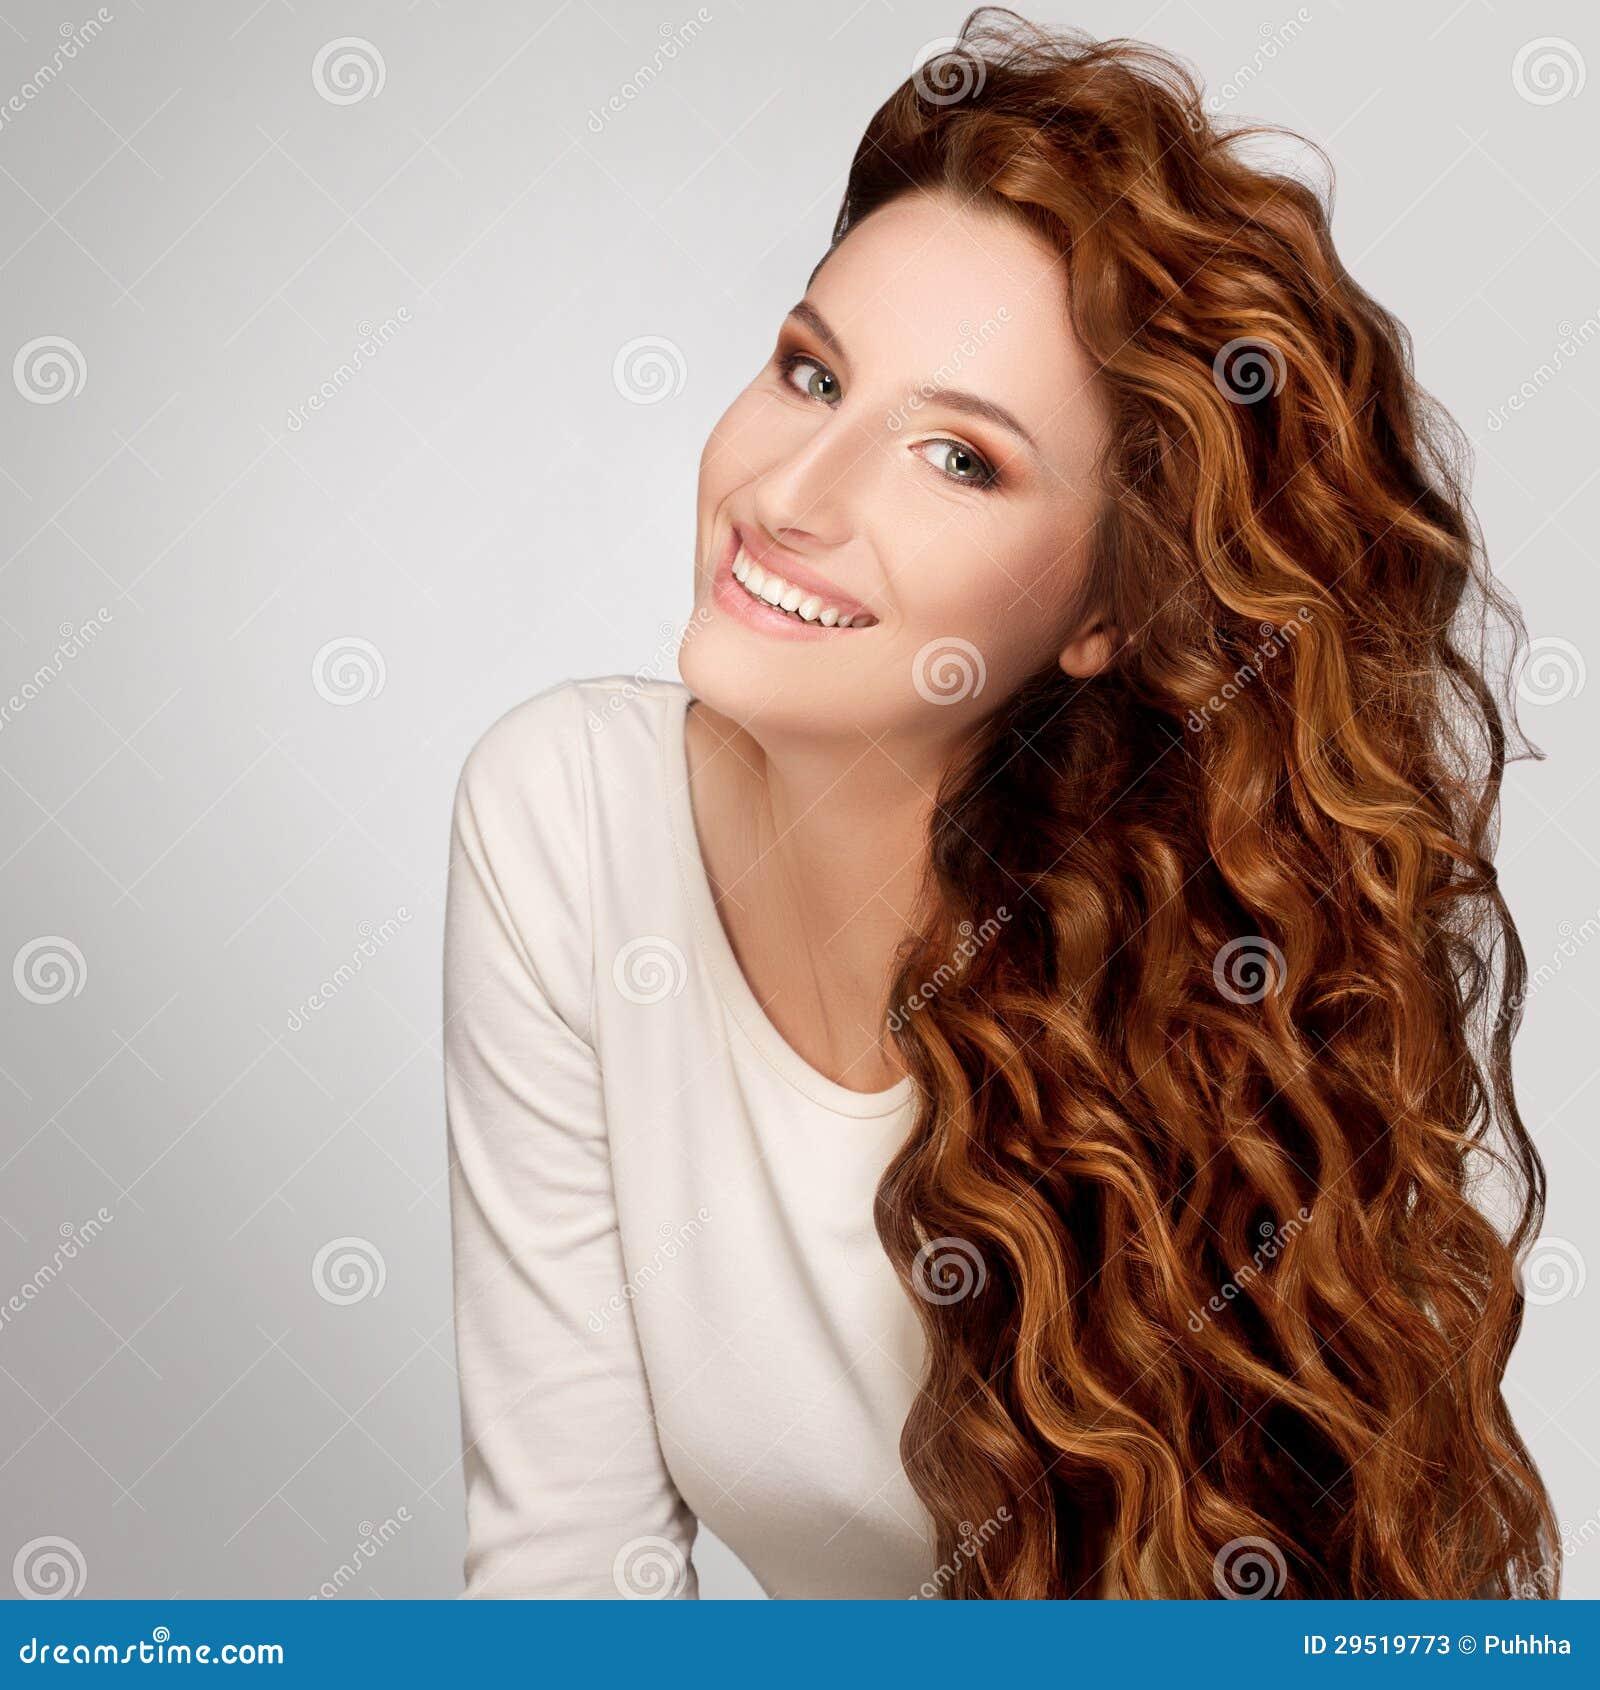 clase alta xxx cabello rojo